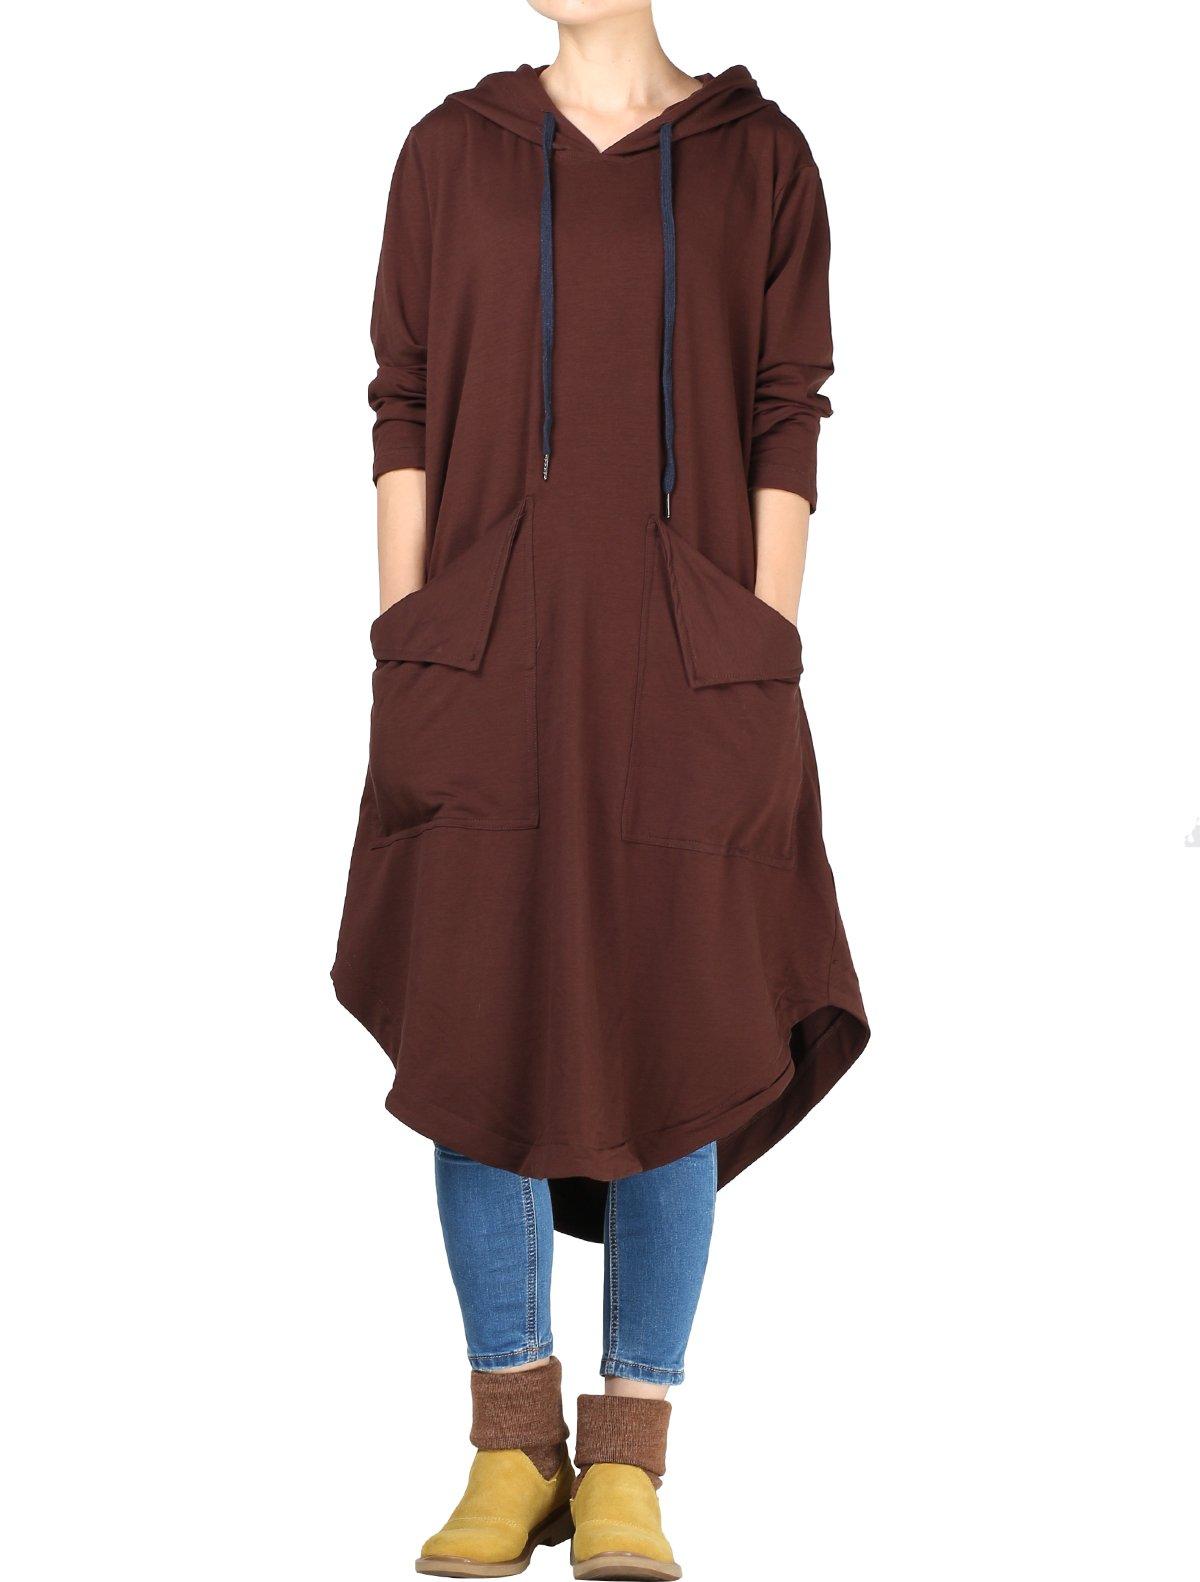 Mordenmiss Women's Drawstring Hood Sweatshirt Dress with Big Pockets L Coffee